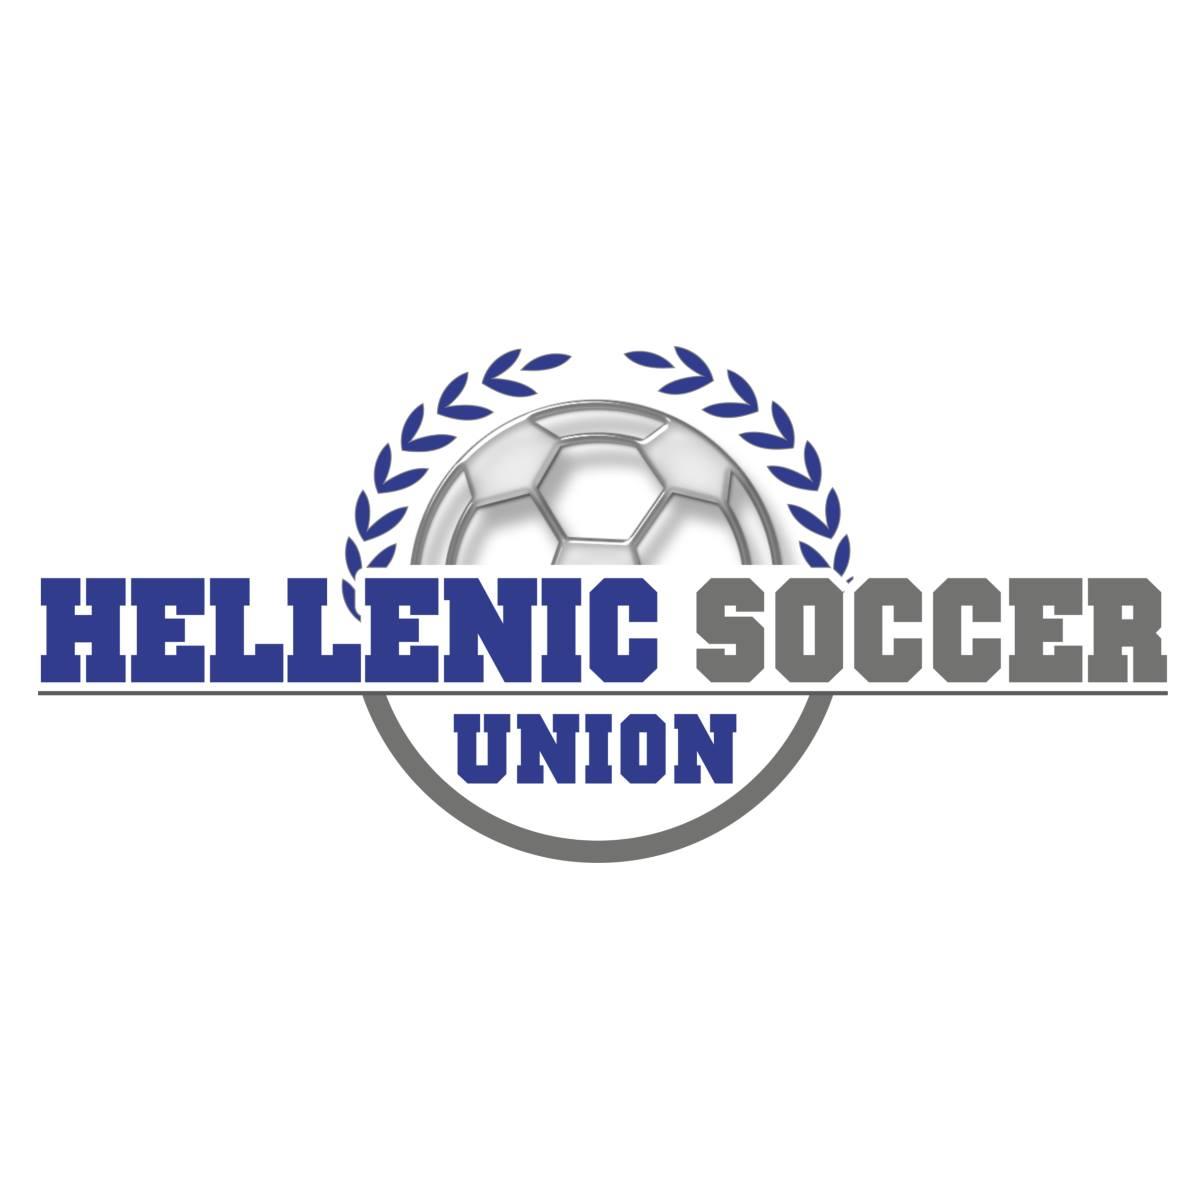 Hellenic Soccer Union logo